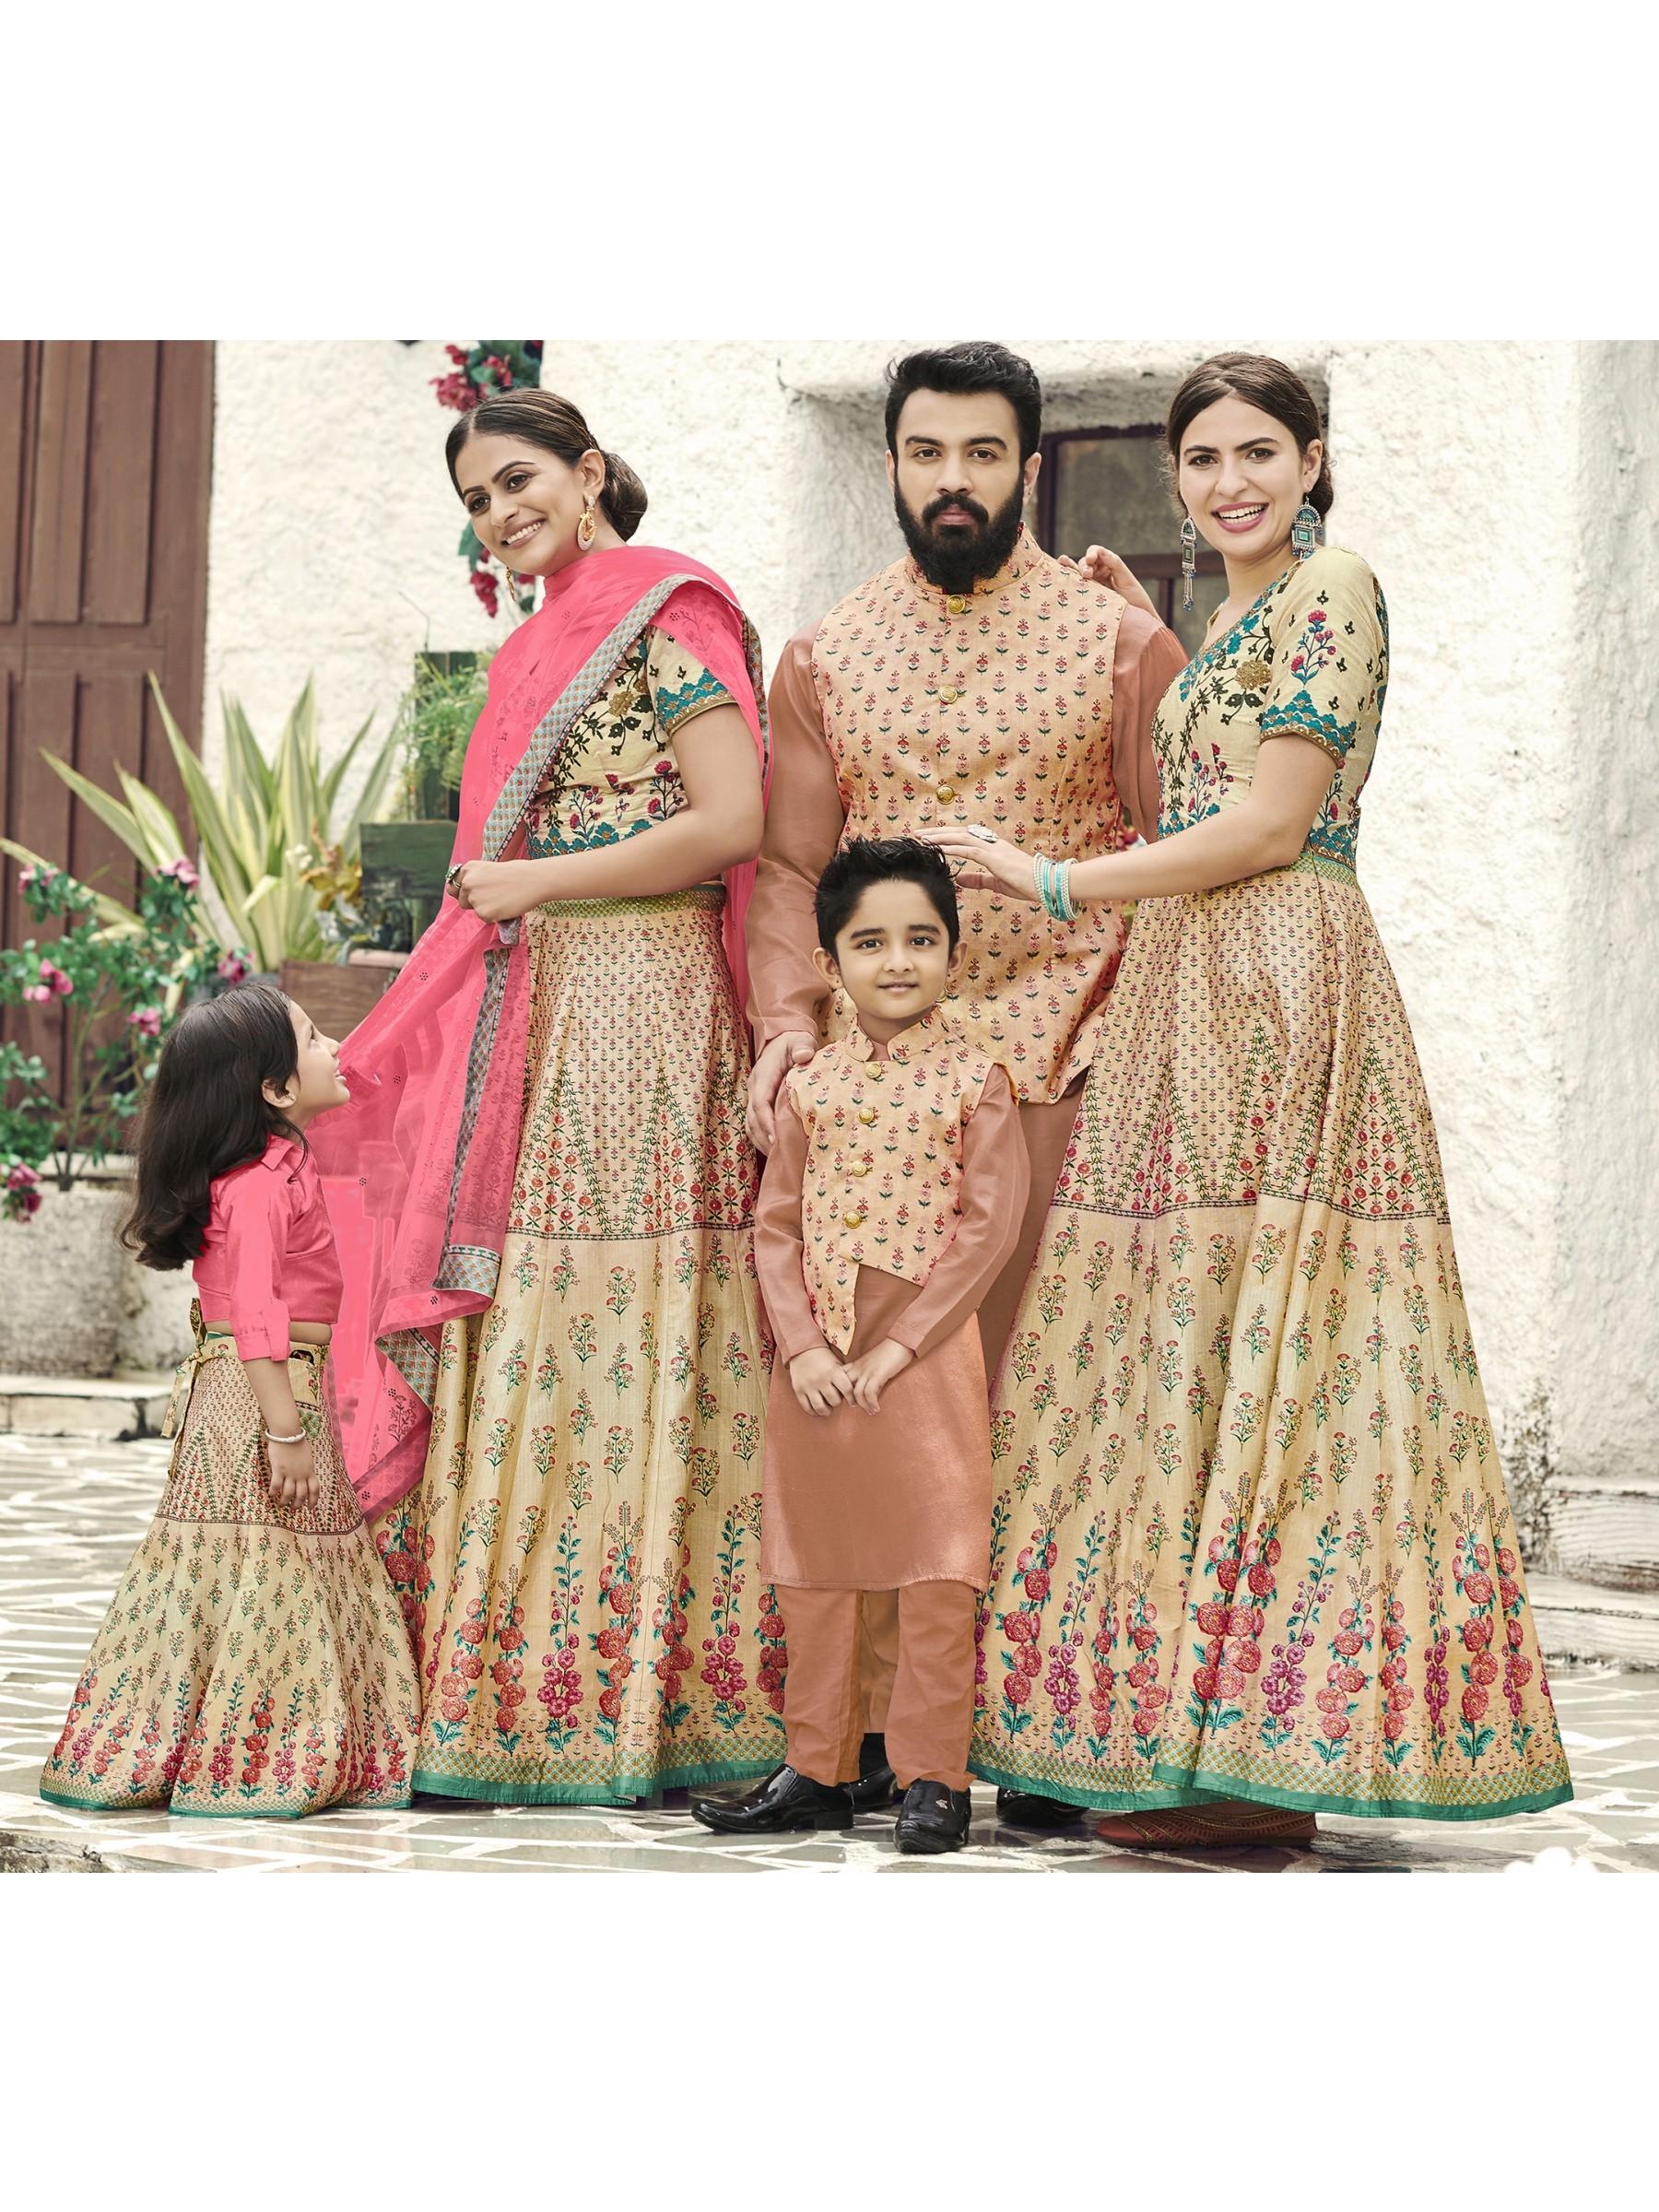 Pure Heritage Silk Wedding Wear Full Family Combo in Beige color Digital Print Work & Stone Work